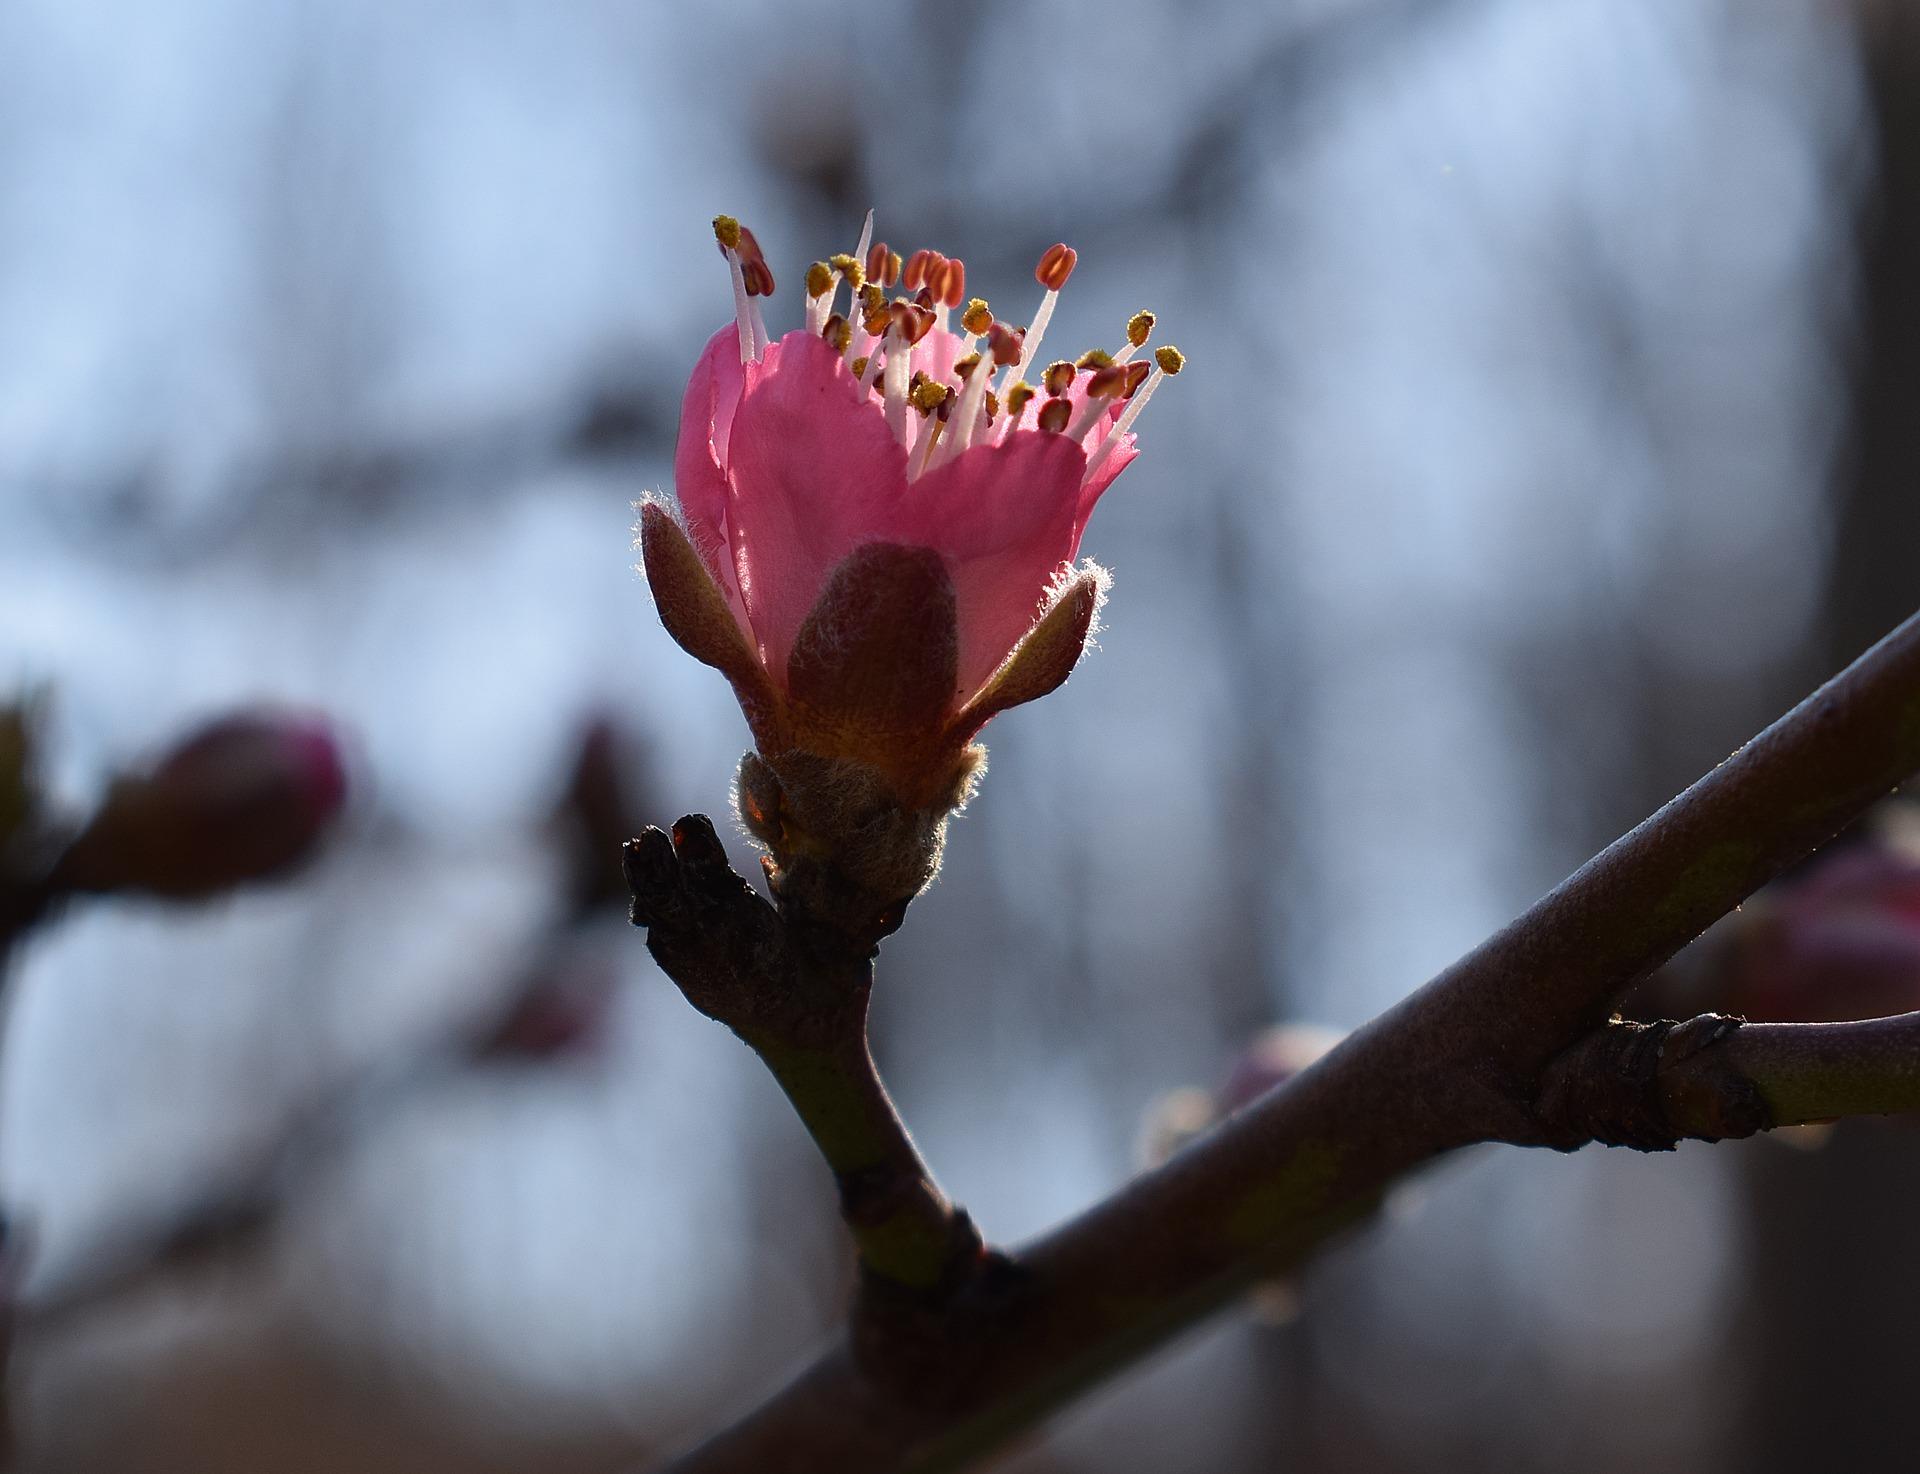 Картинка бутон цветка персика